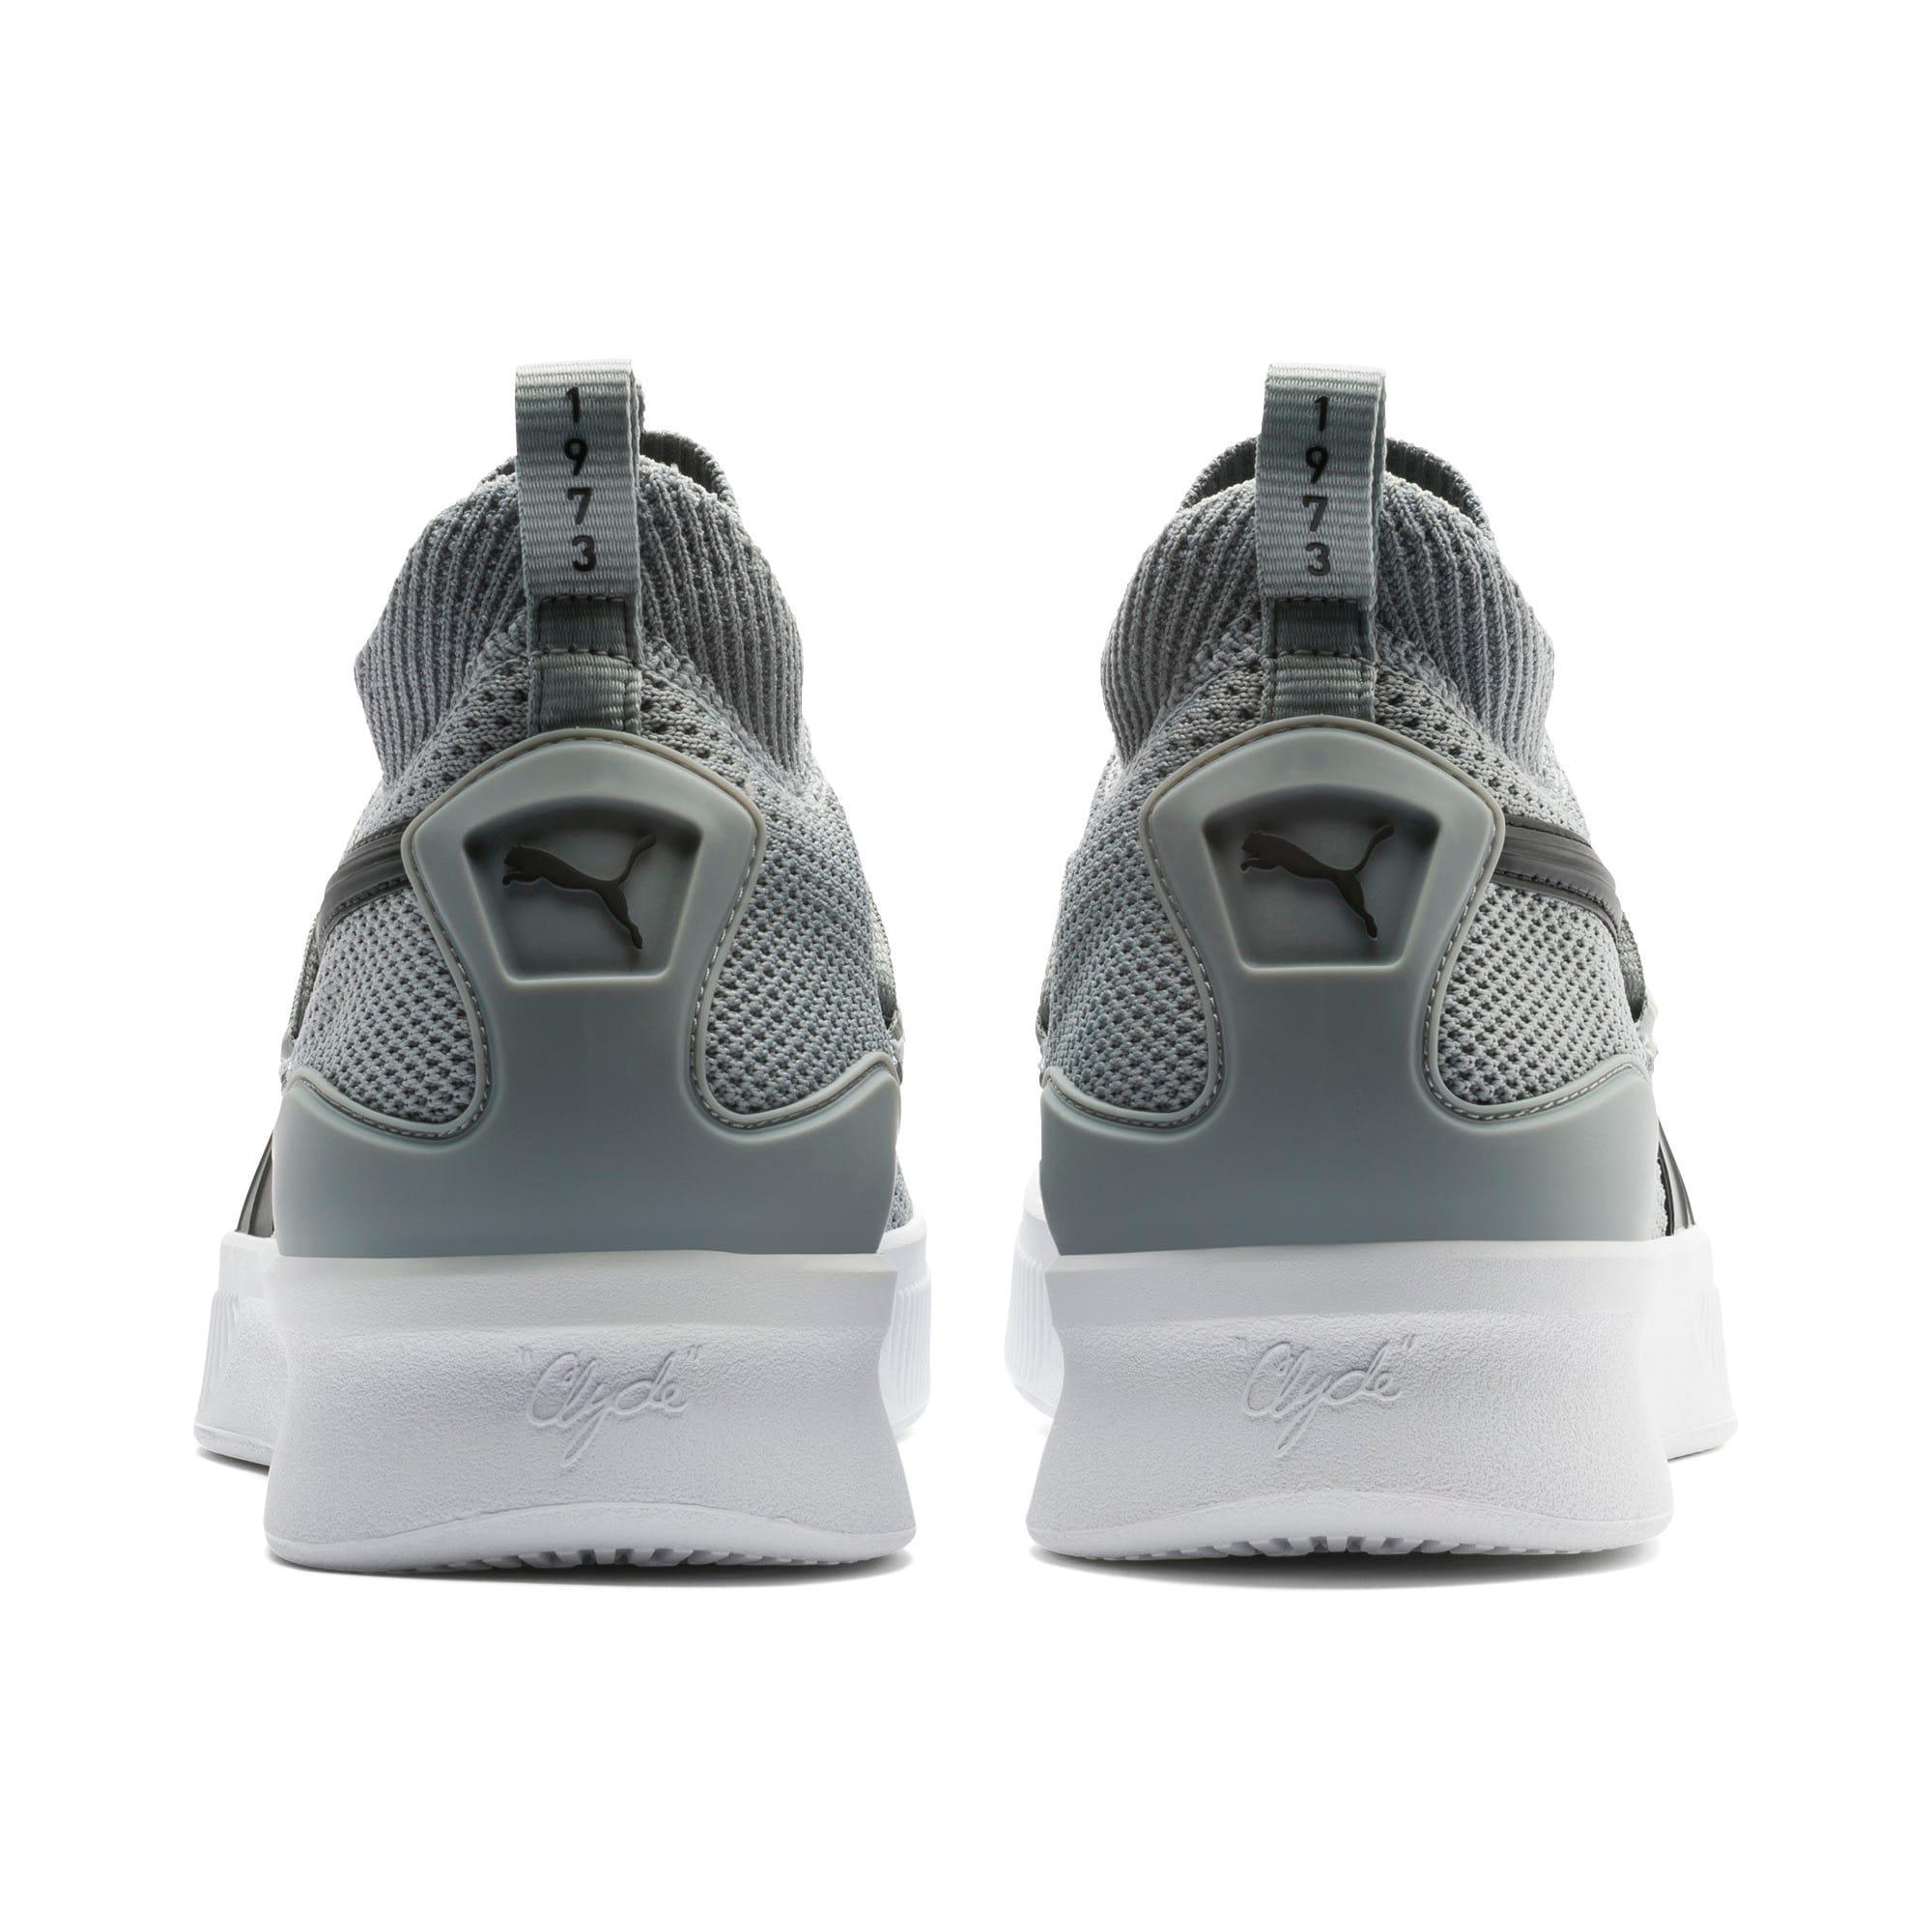 Thumbnail 3 of Clyde Court Core Basketball Shoes, Quarry-Puma Black, medium